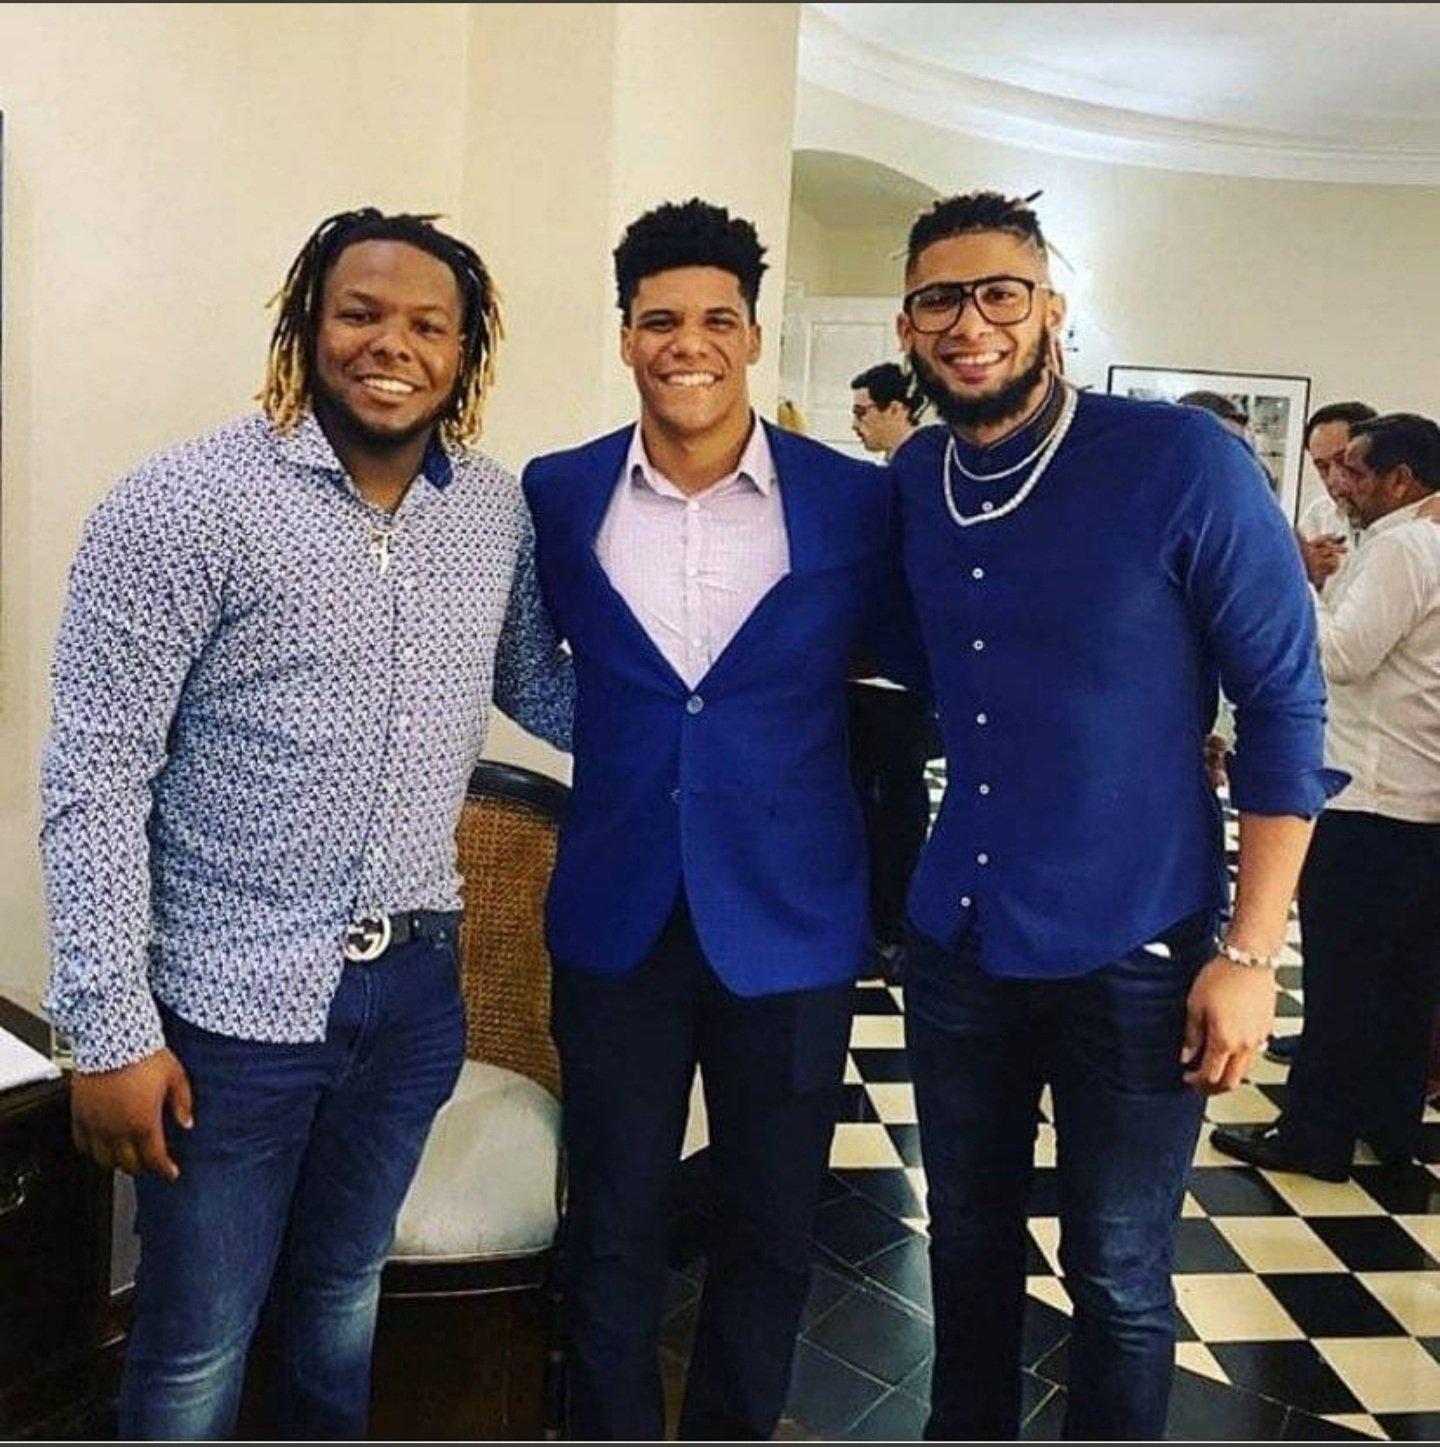 Tripleta  deportiva -Turística de RD en MLB Bladi Guerrero Jr. Juan Soto y Fdo.Tatis Jr.